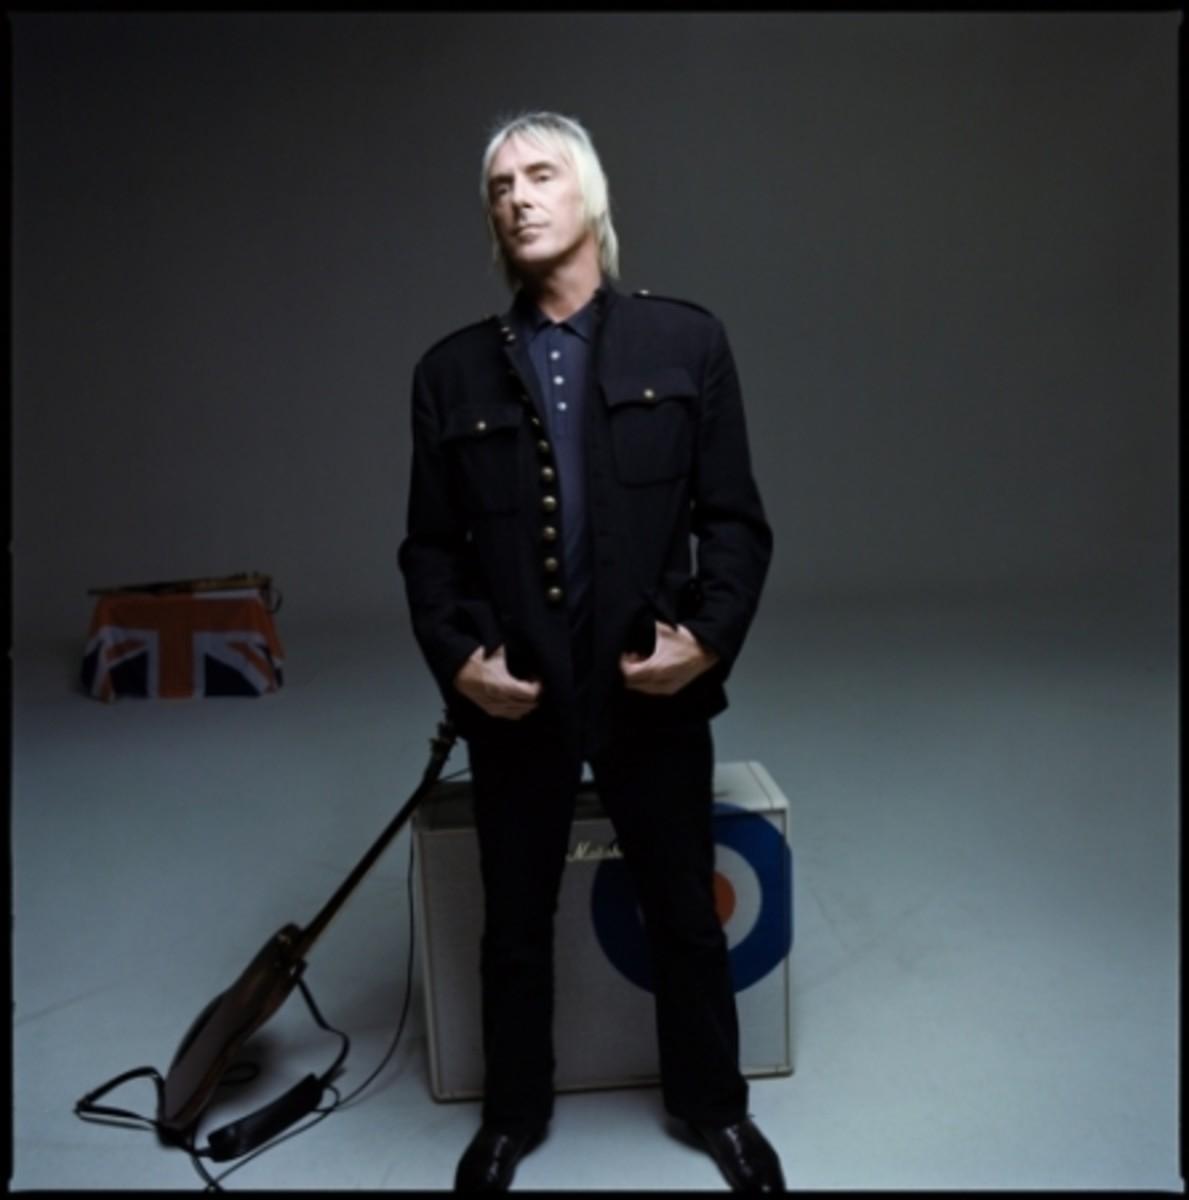 Paul Weller has been doing heavy promotion for his new album on UK music radio.